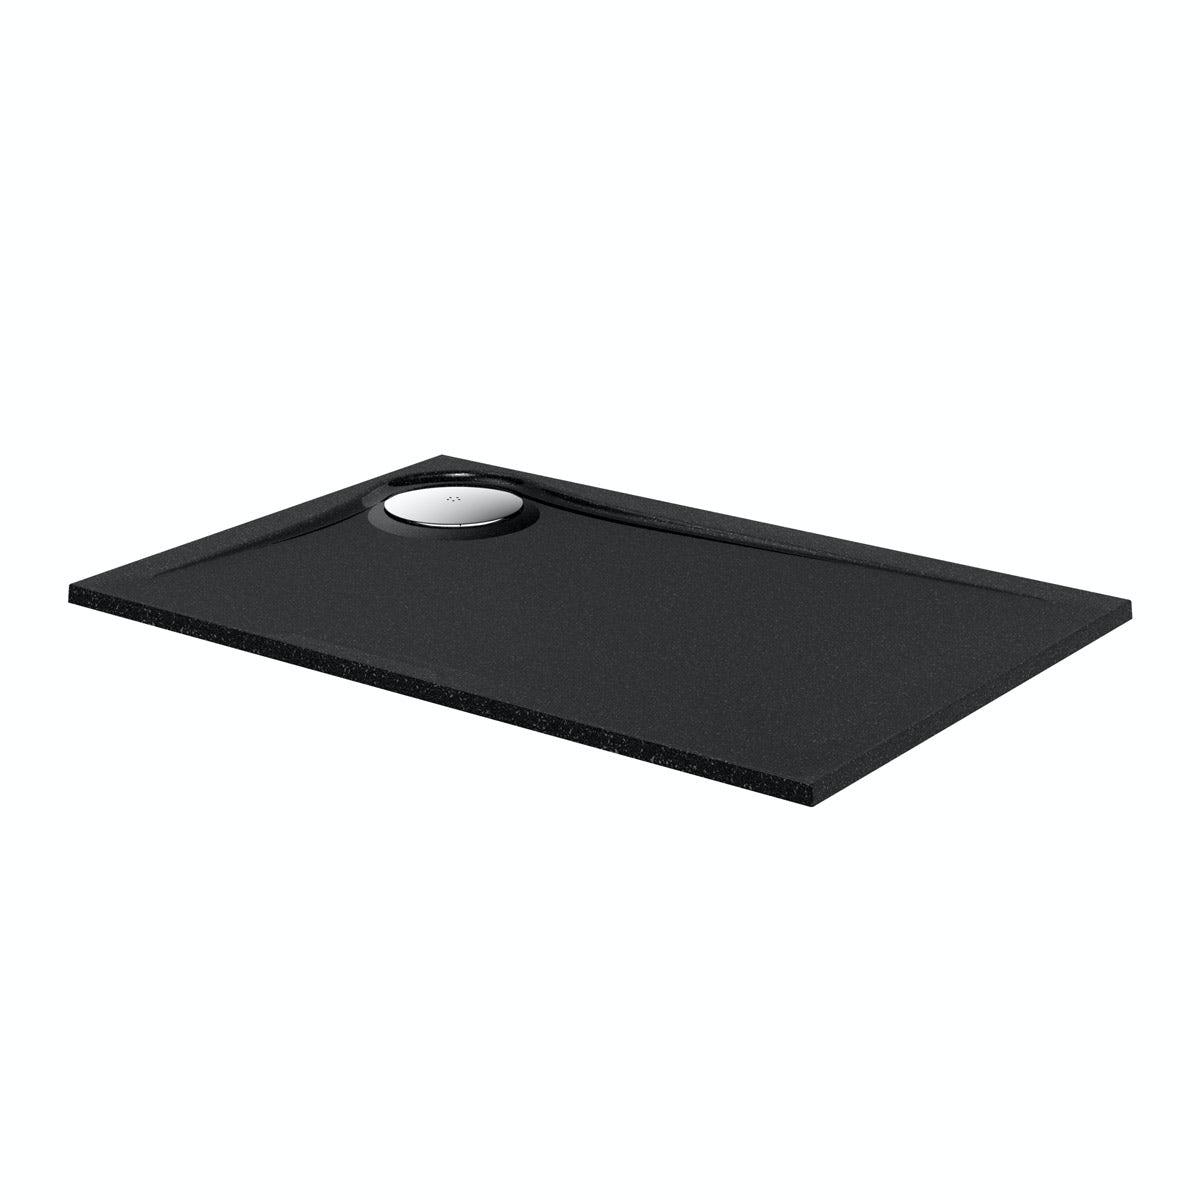 Mode black granite effect right handed rectangular stone shower tray 1200 x 800